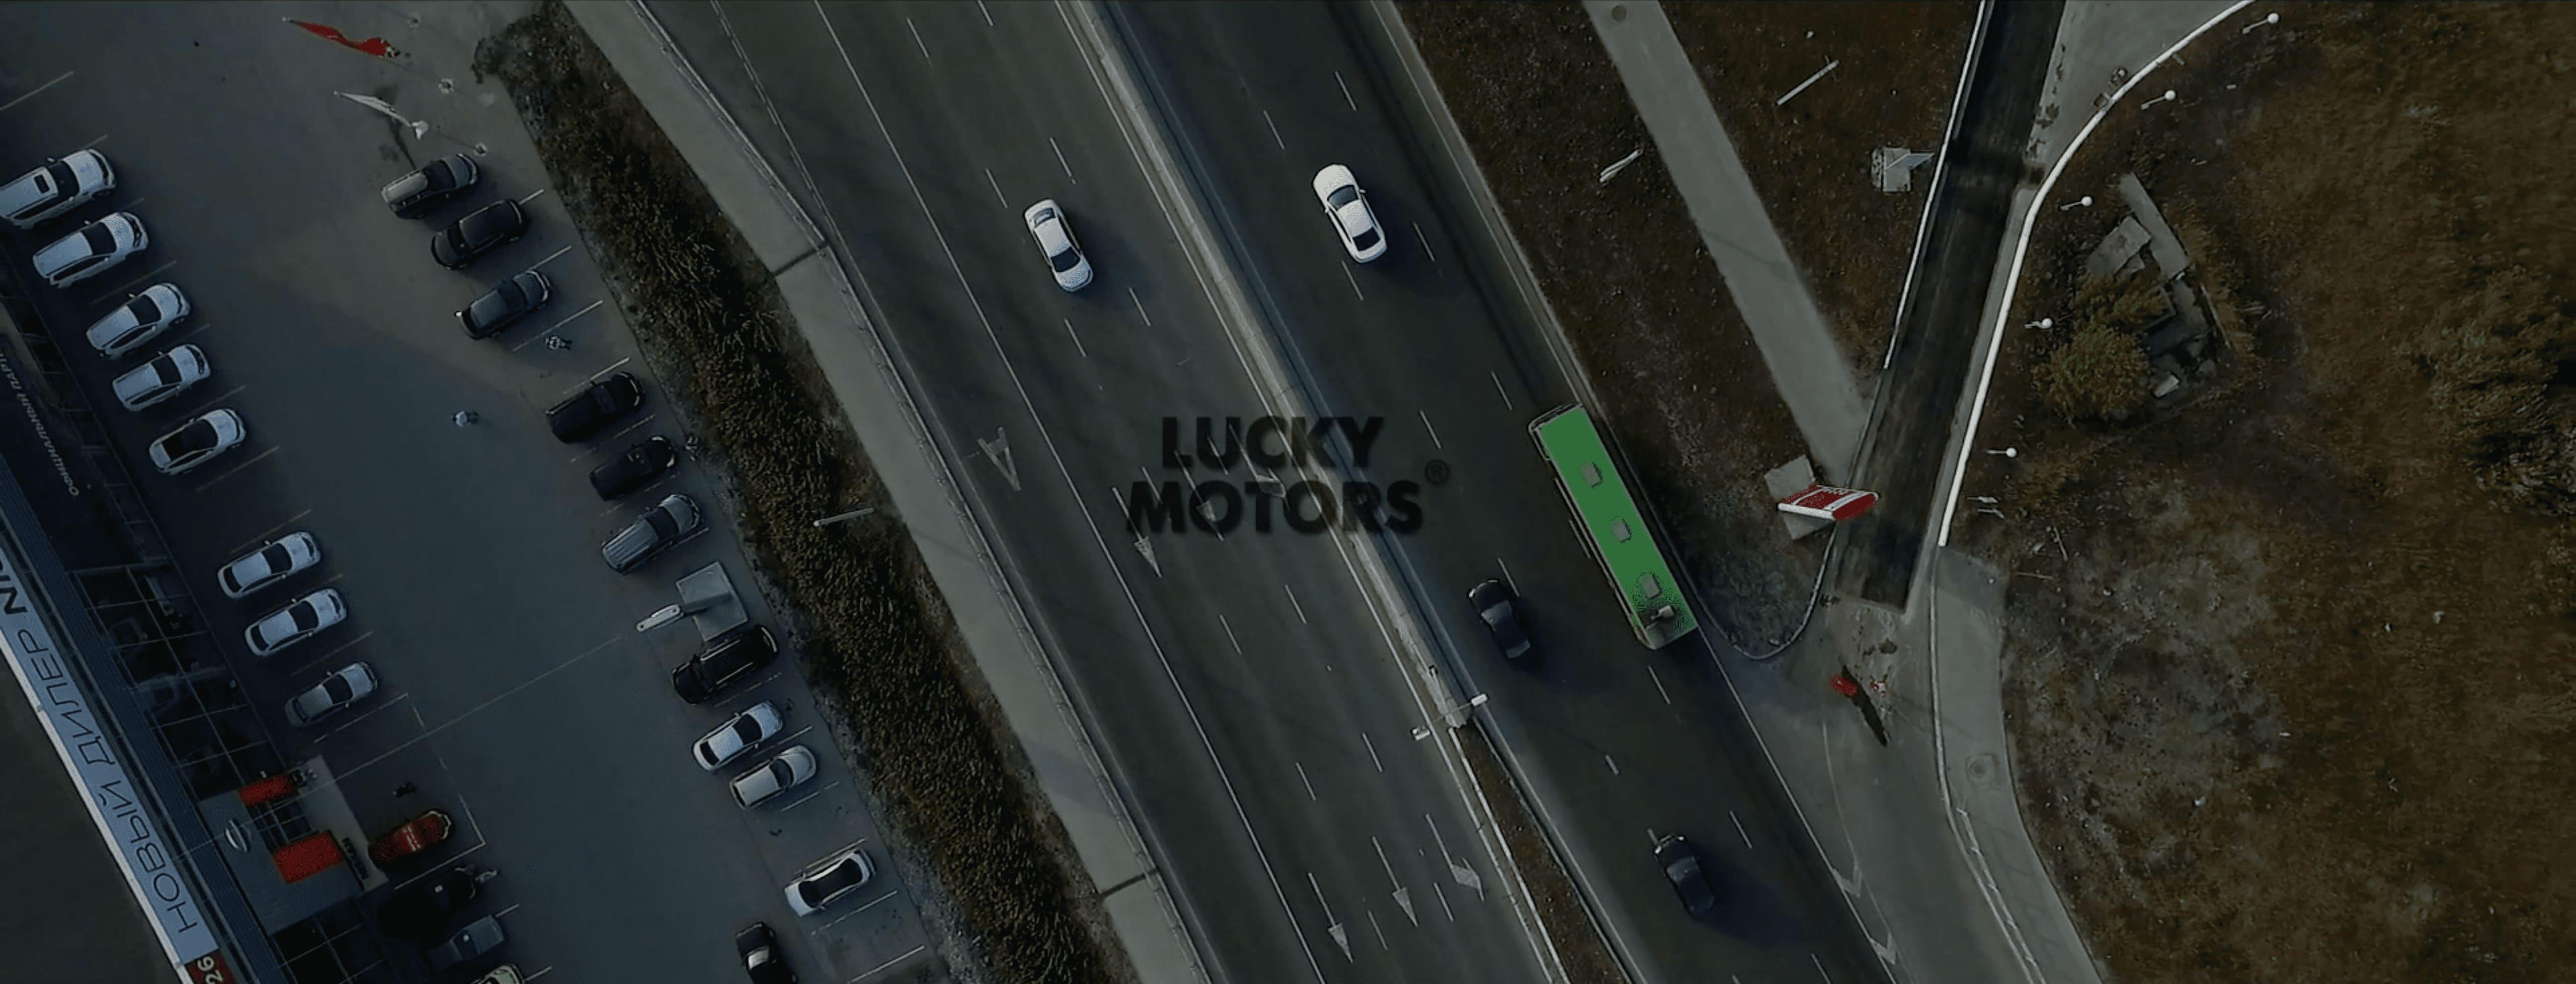 Nissan Murano Presentation (Lucky Motors)